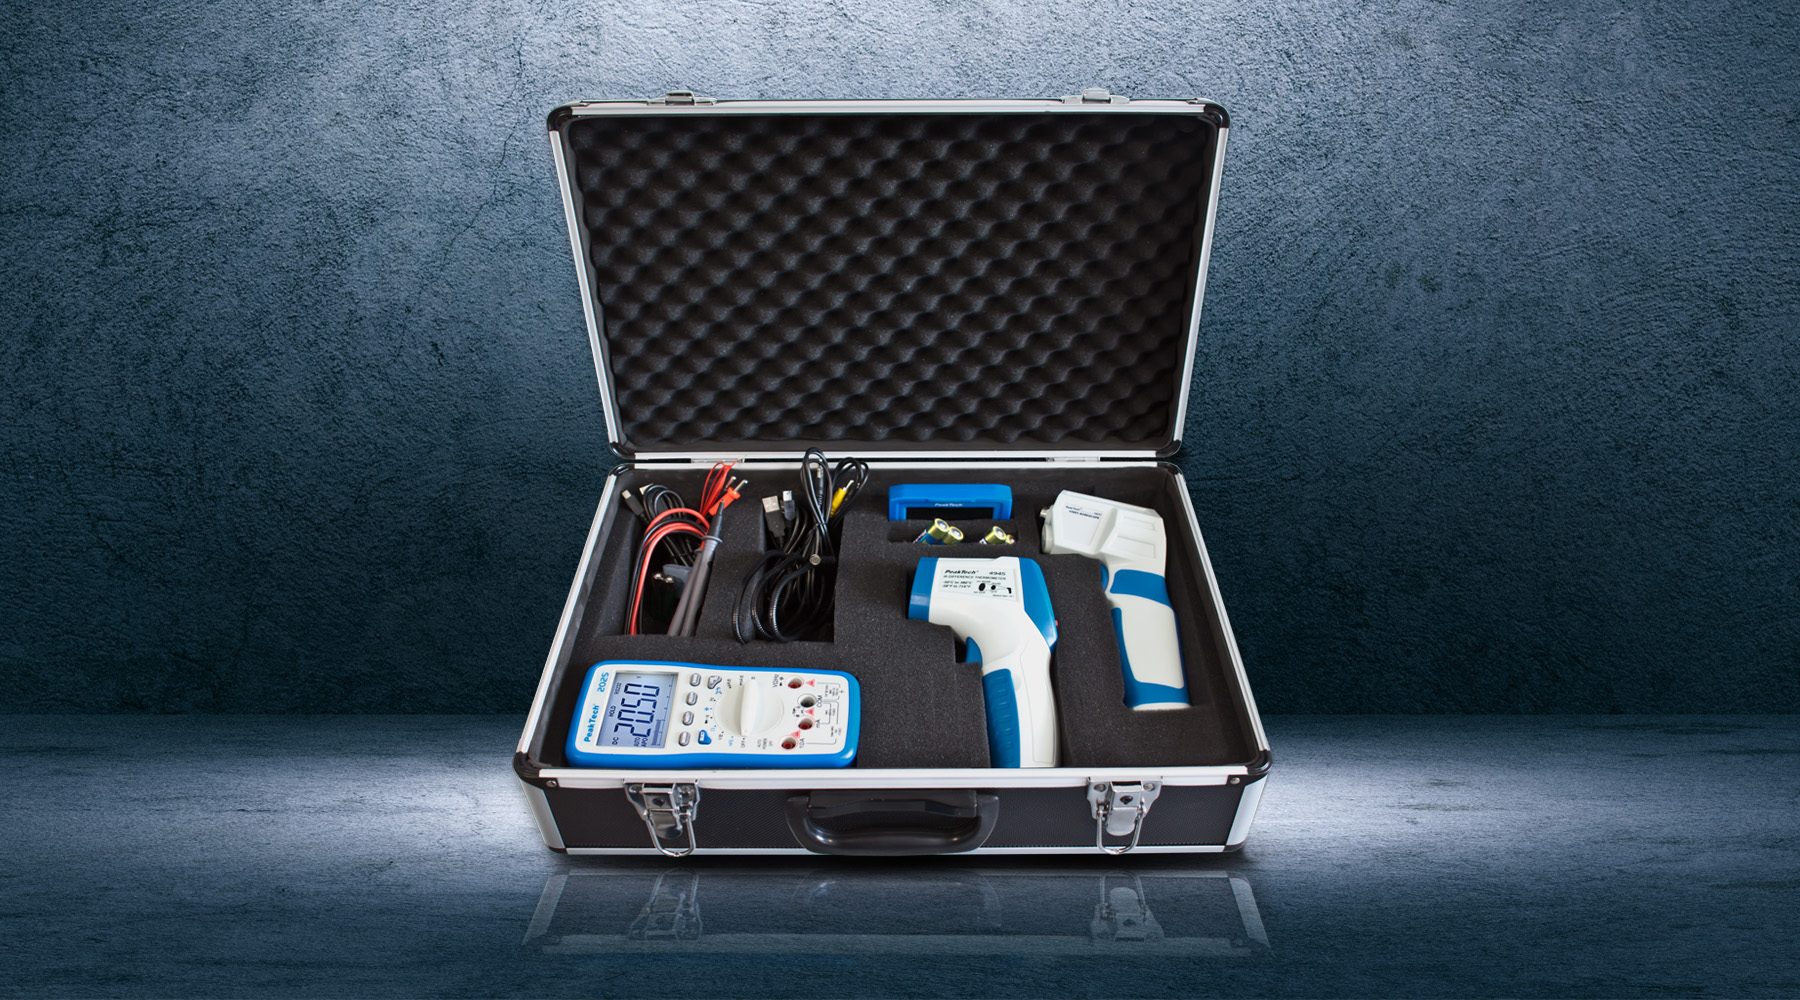 Measuring equipment sets